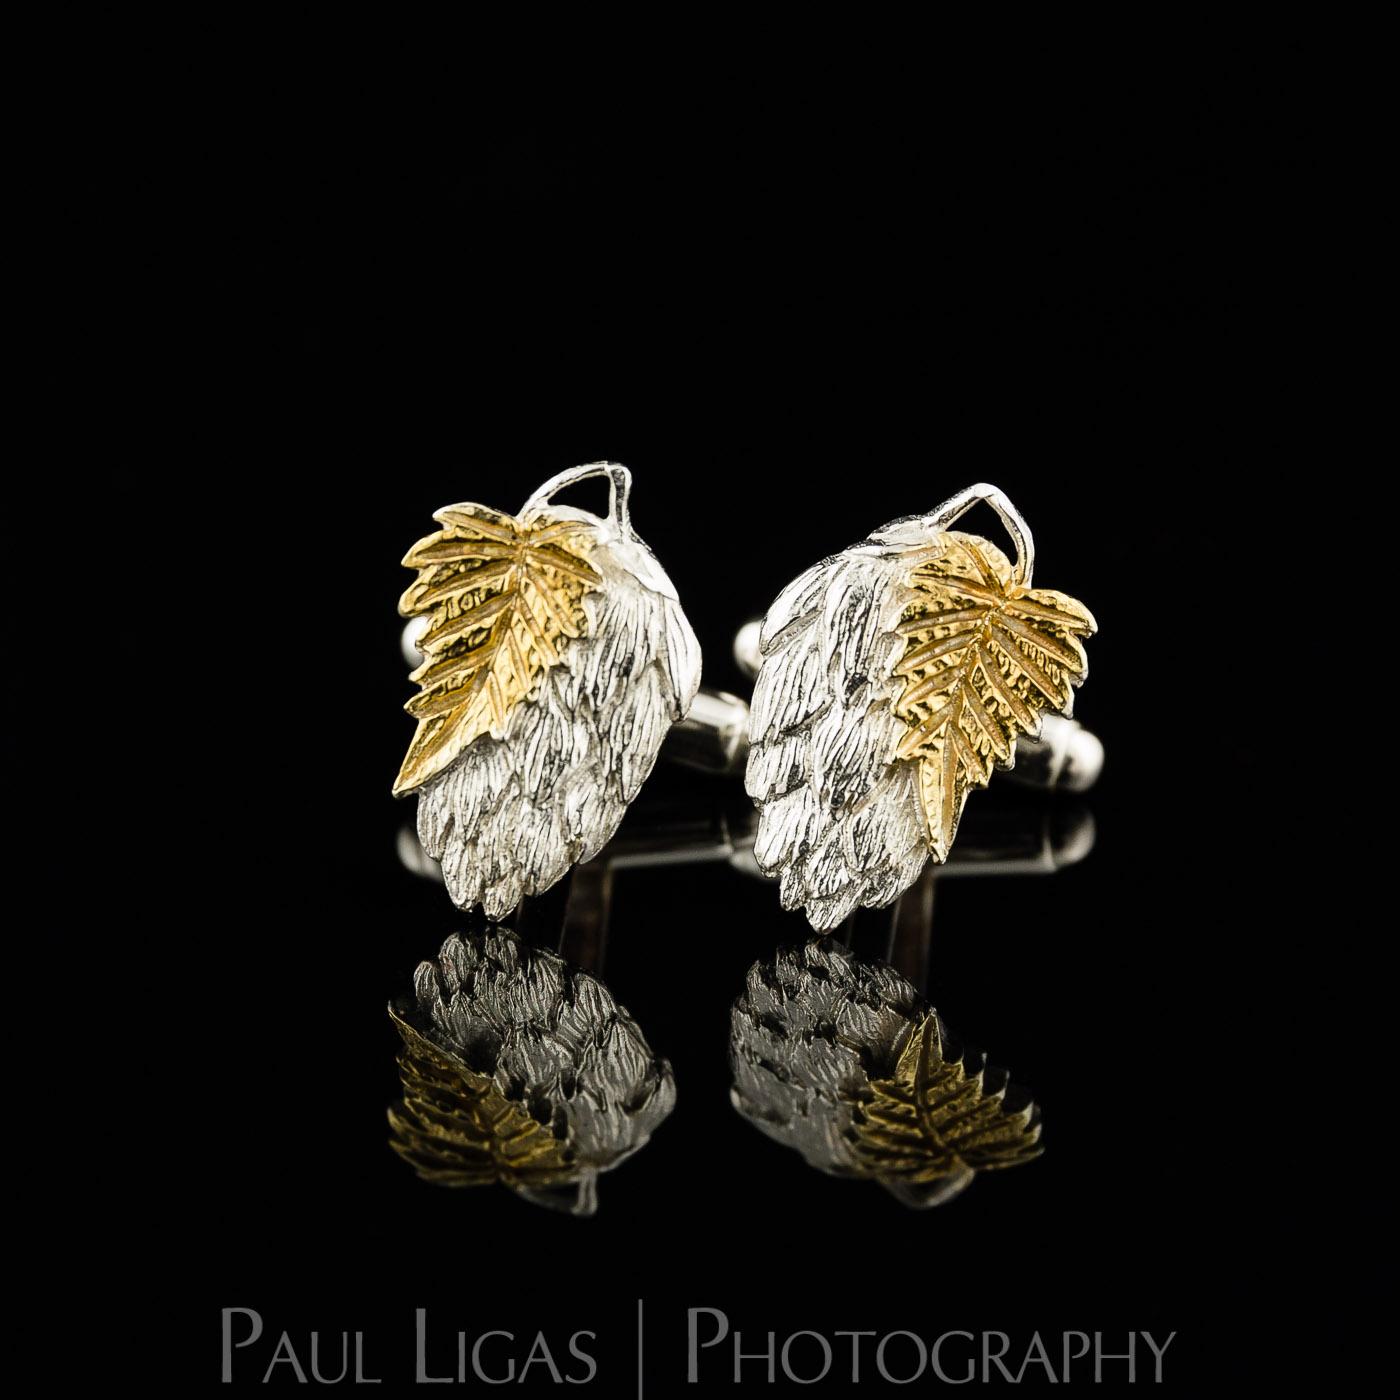 JB Gaynan & Son | Paul Ligas Photography